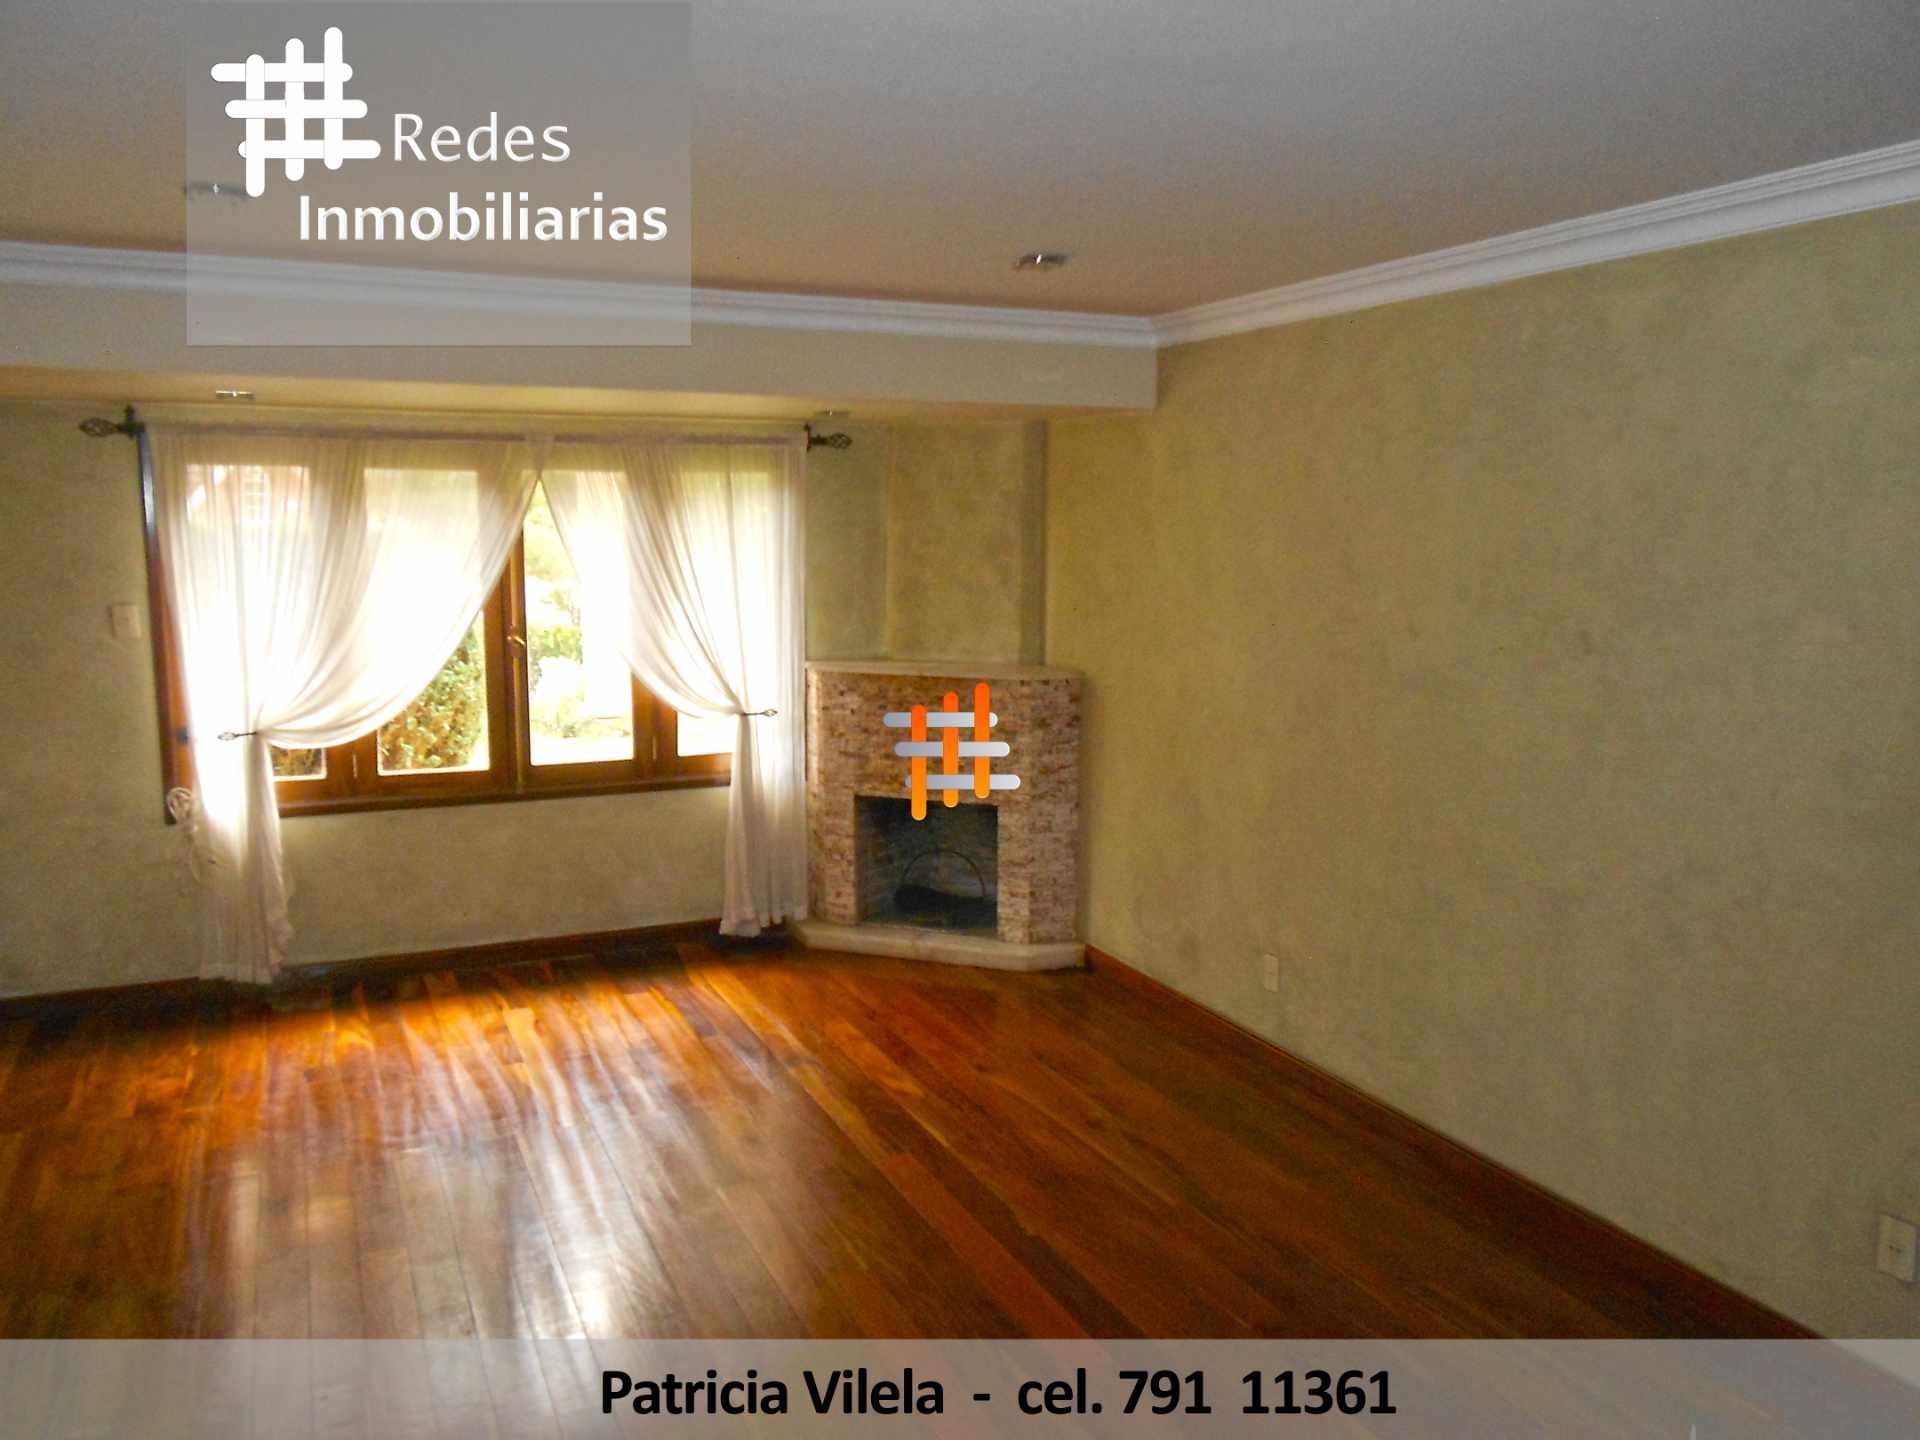 Casa en Alquiler HERMOSA RESIDENCIA EN ALQUILER  ...ARANJUEZ Foto 12